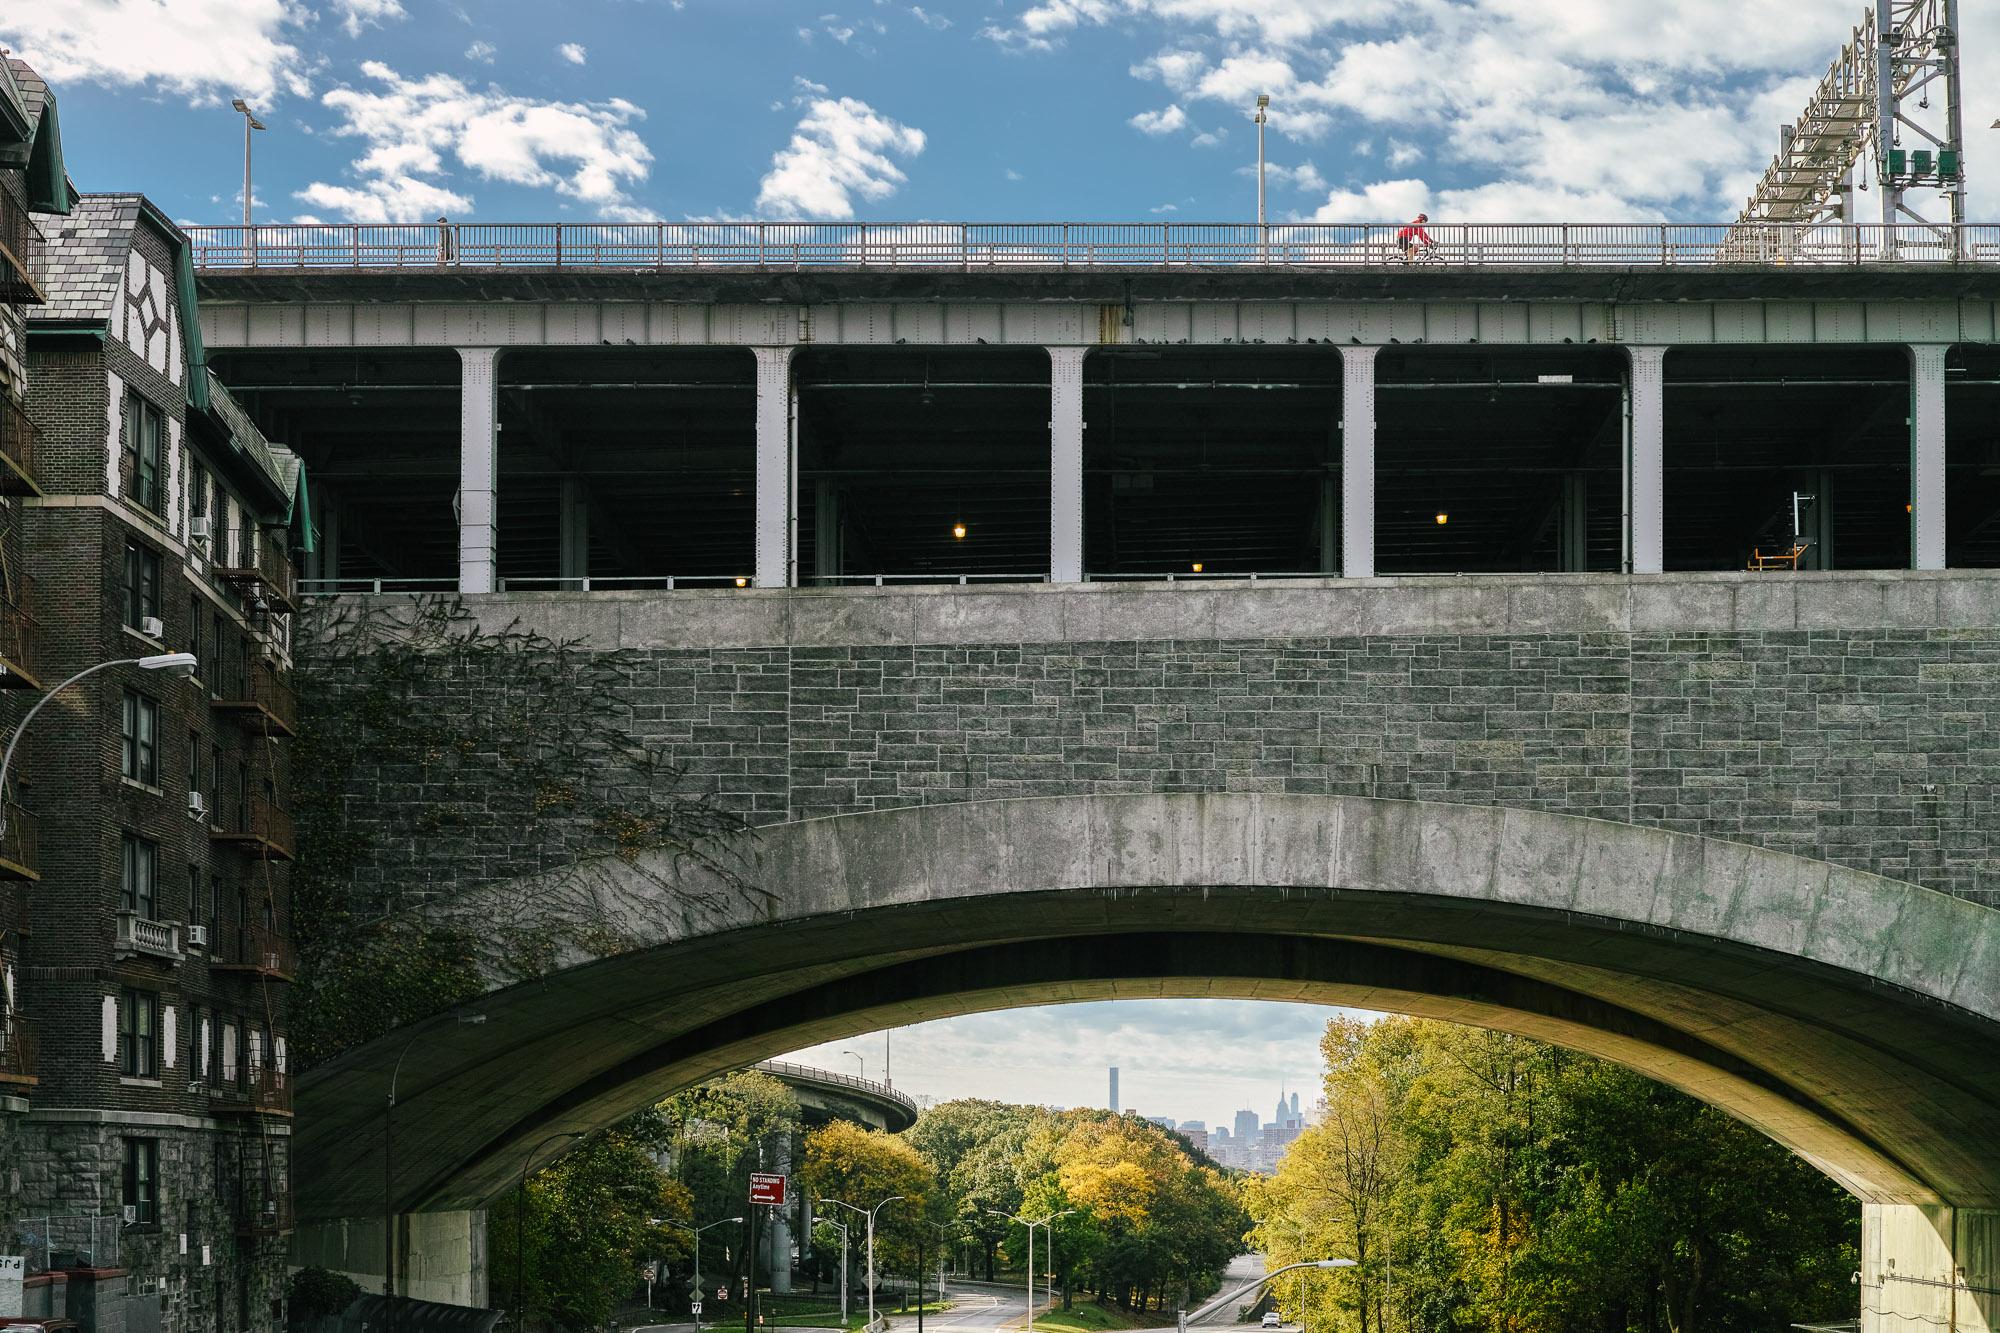 George Washington Bridge overpass in Washington Heights, Manhattan. Sigma DP2 Merrill, 1/800 @ f/4 ISO 100